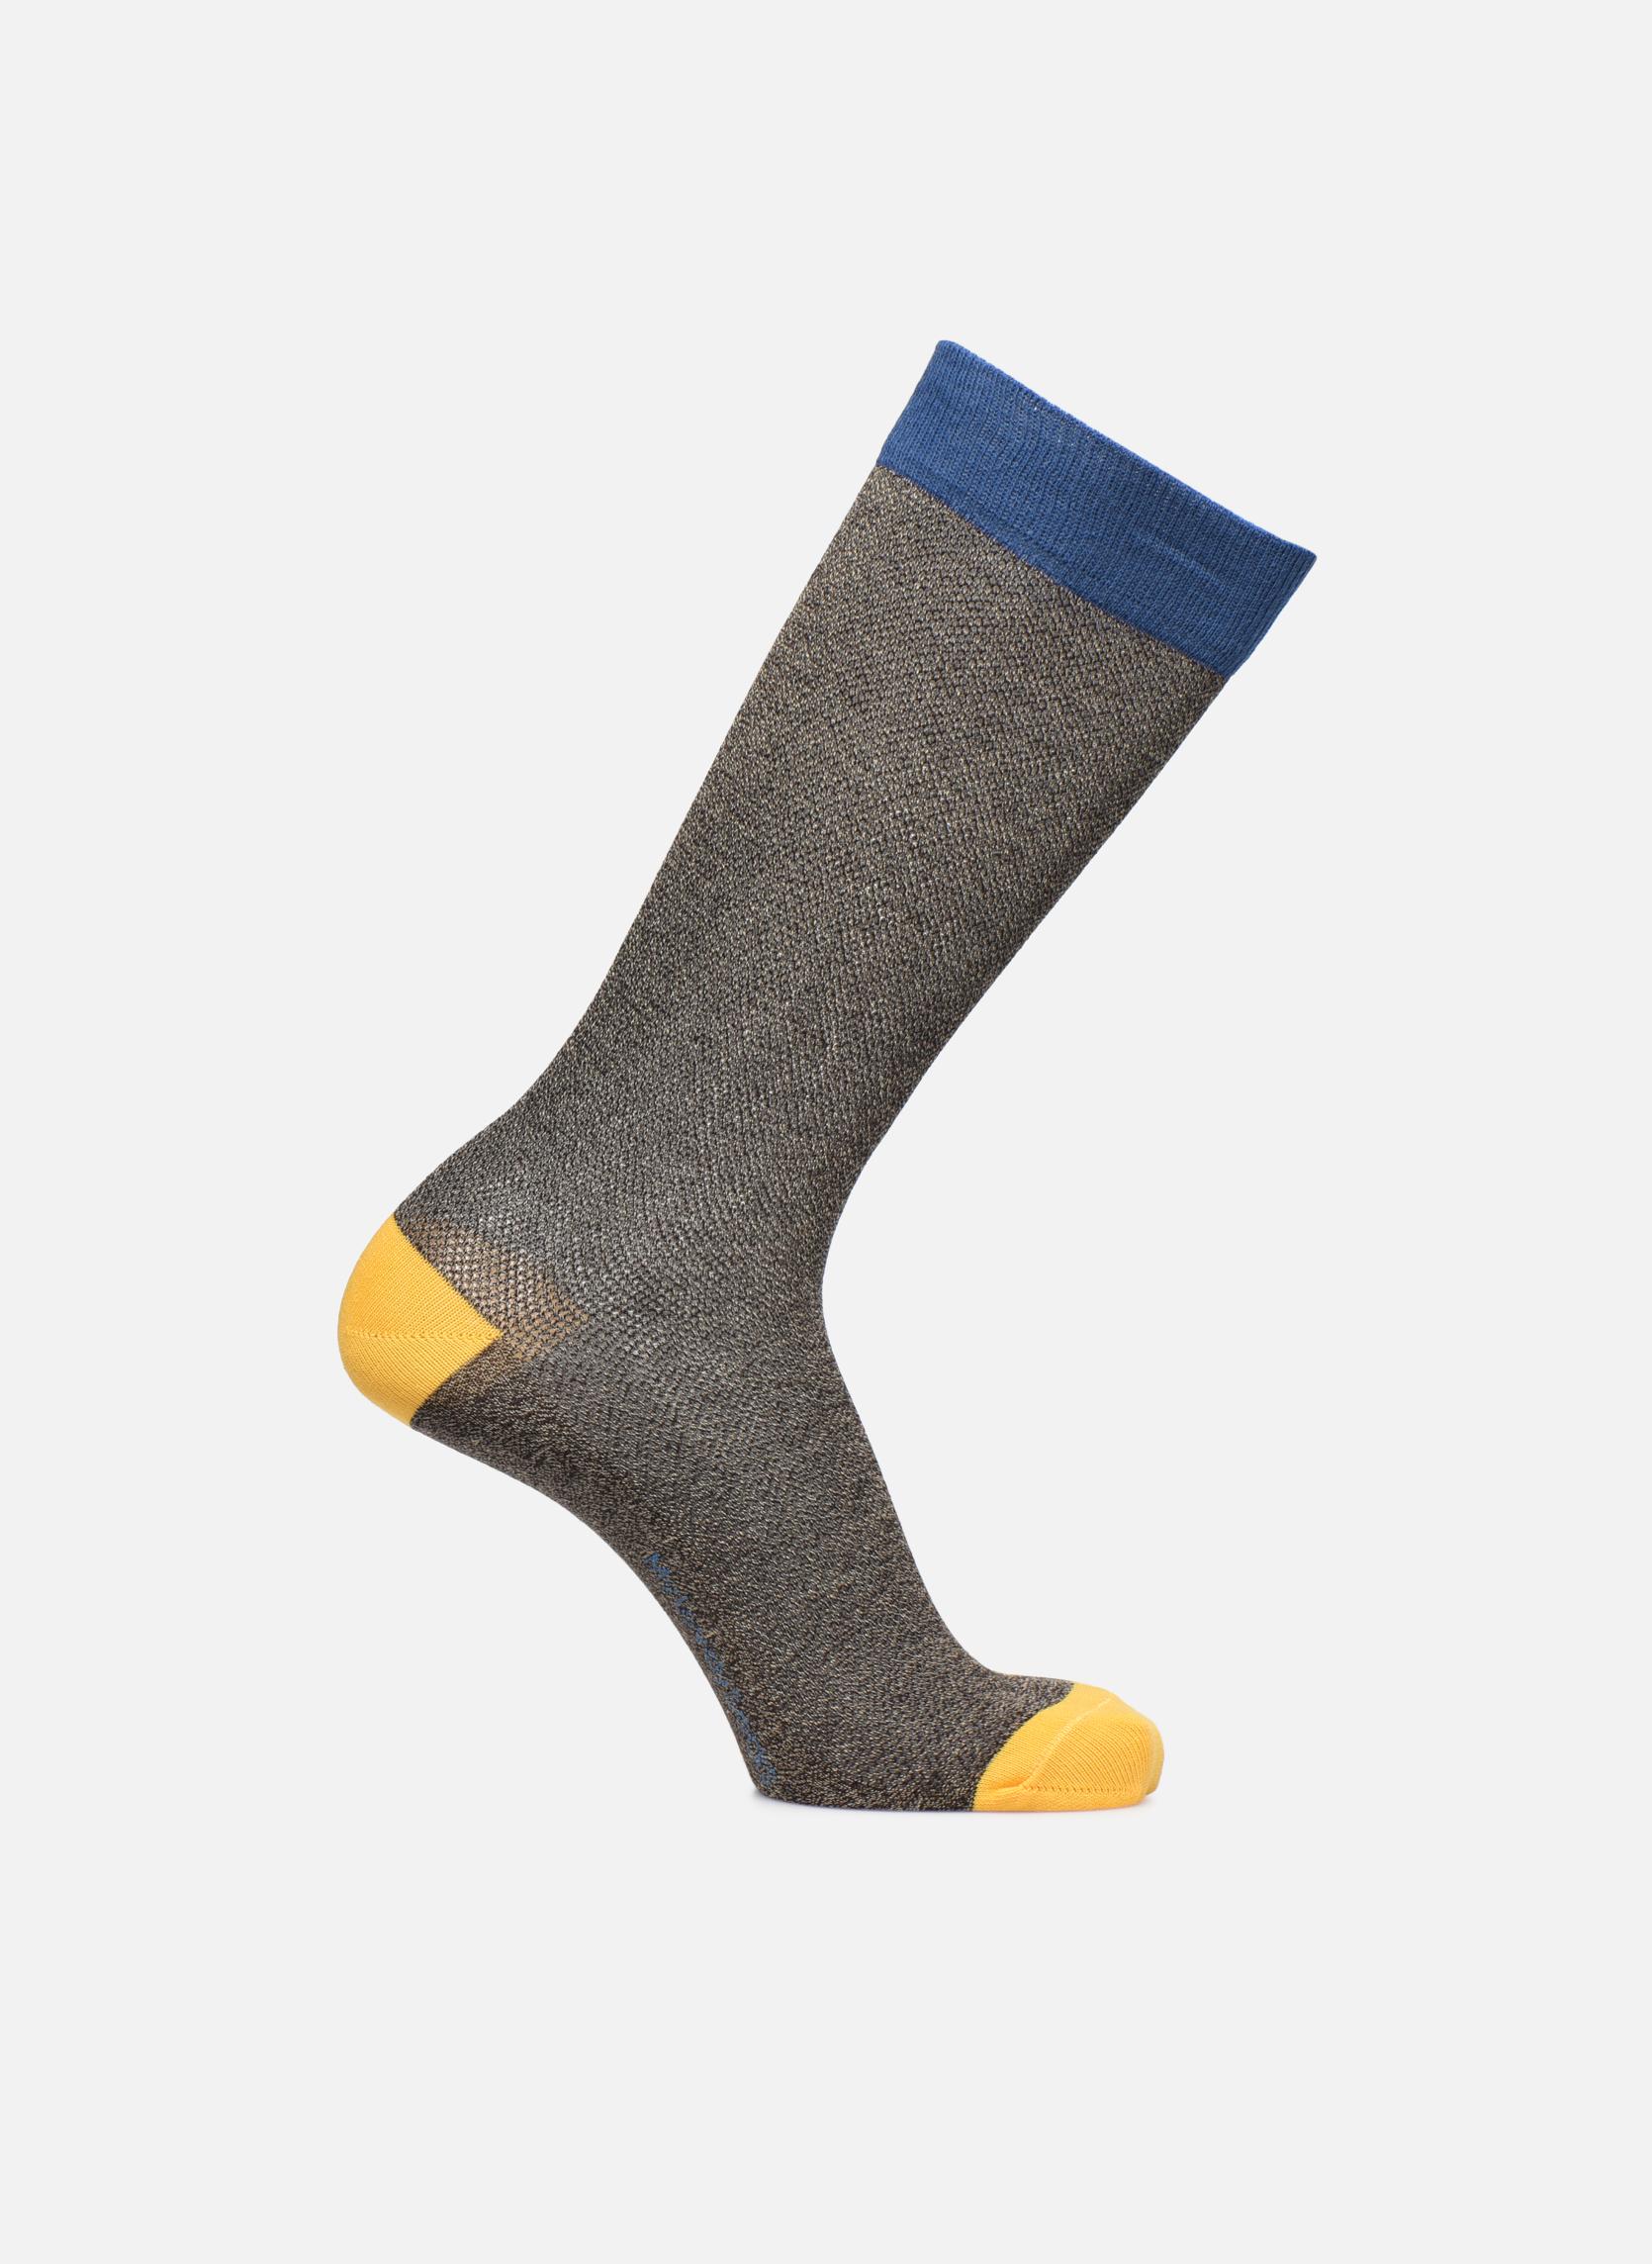 Victor by My Lovely Socks - my lovely socks - sarenza.it